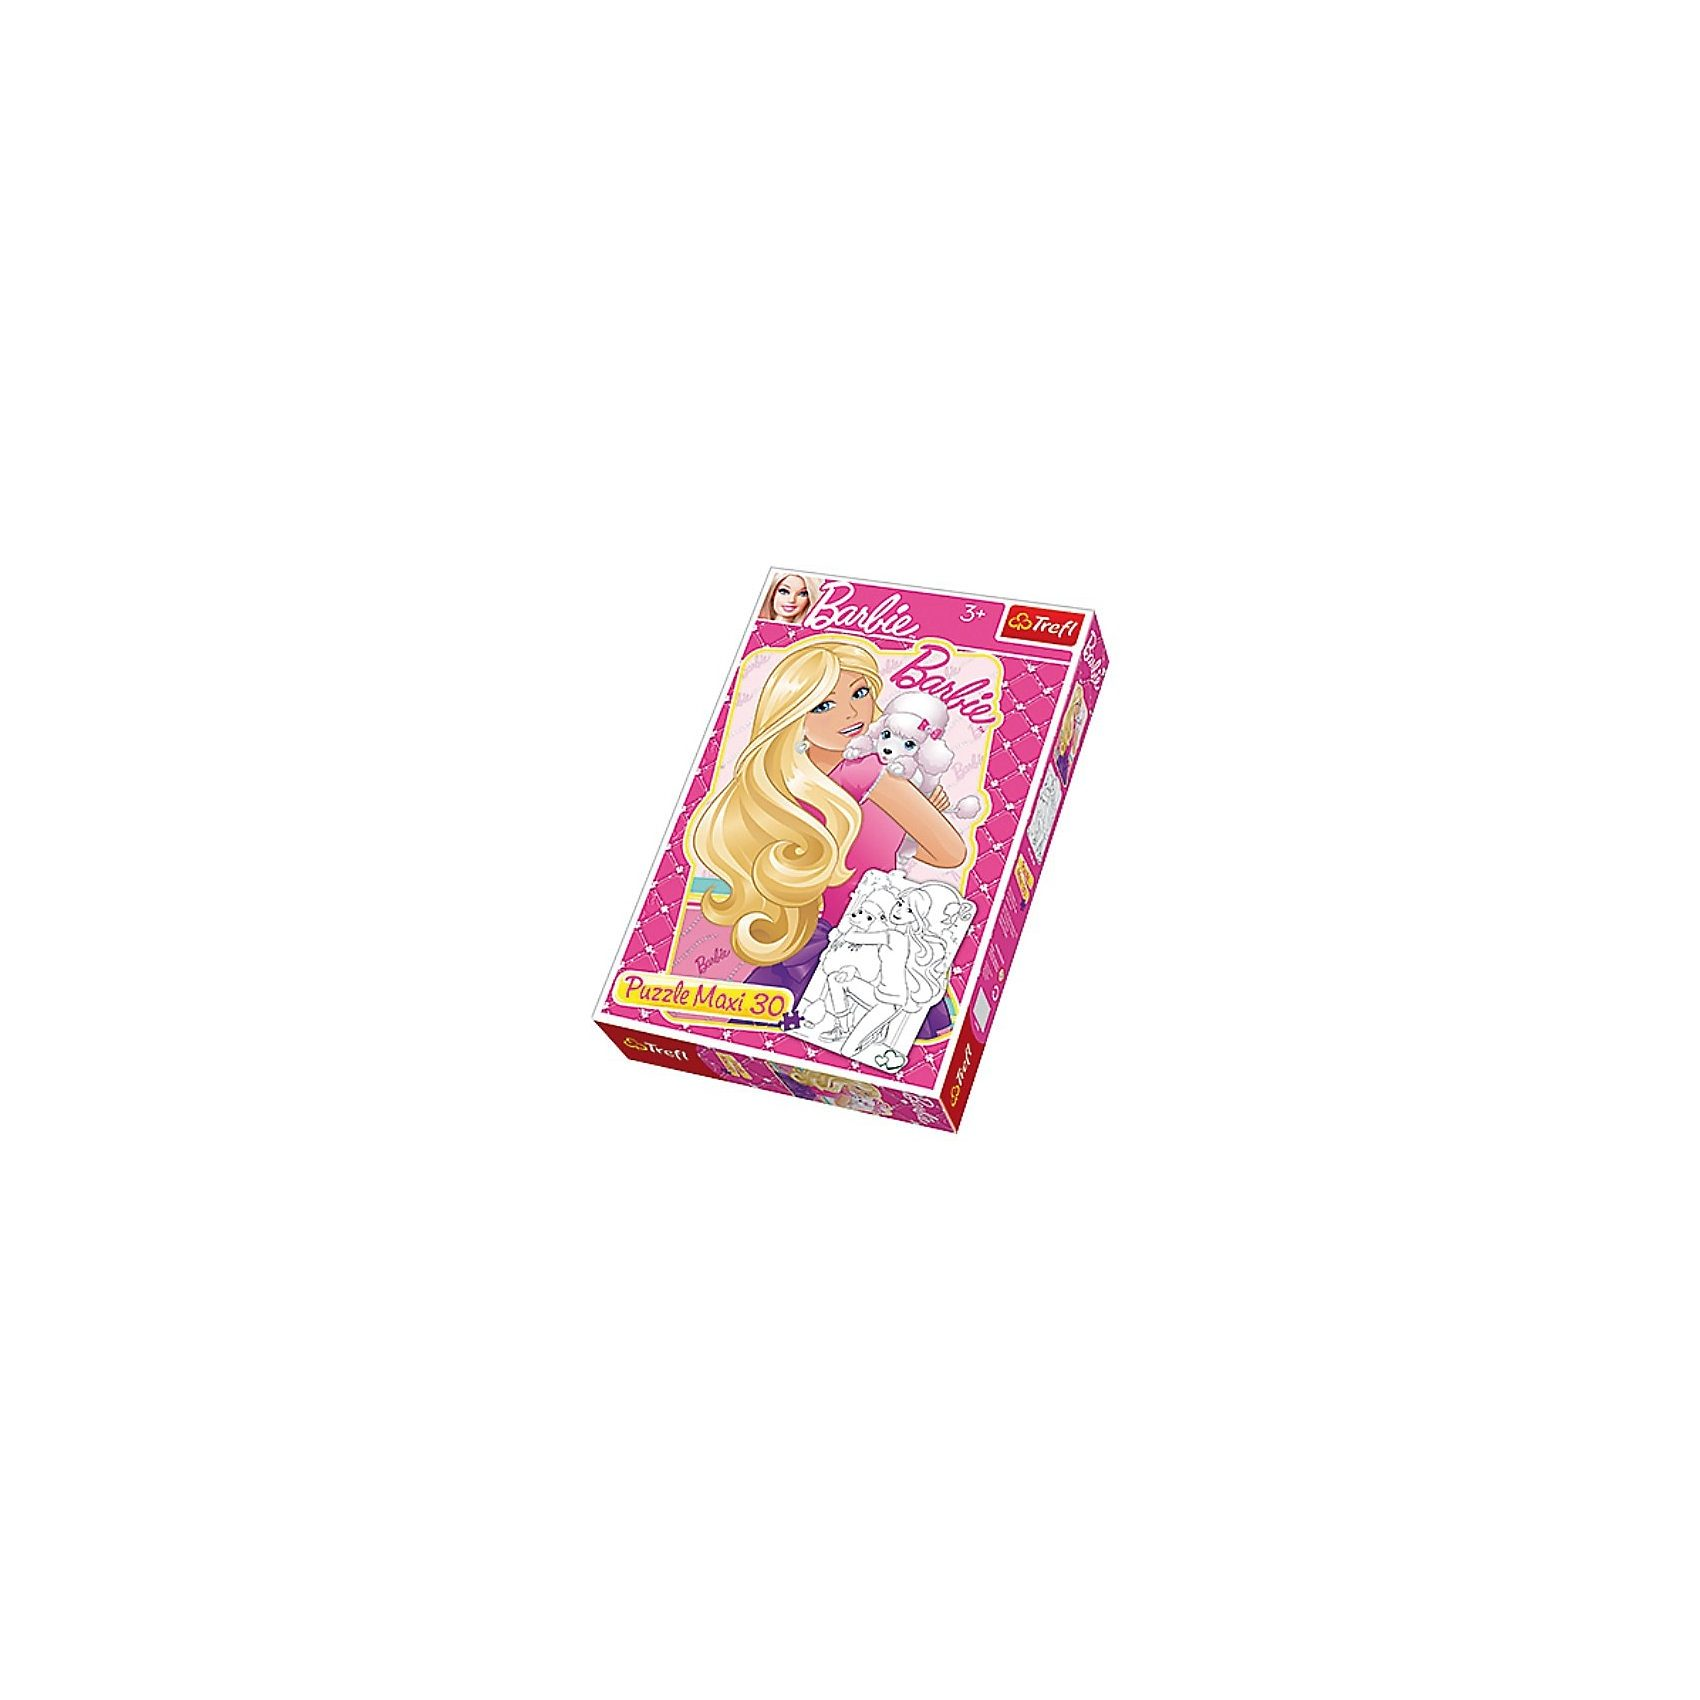 Trefl Maxipuzzle 30 Teile doppelseitig - Barbie